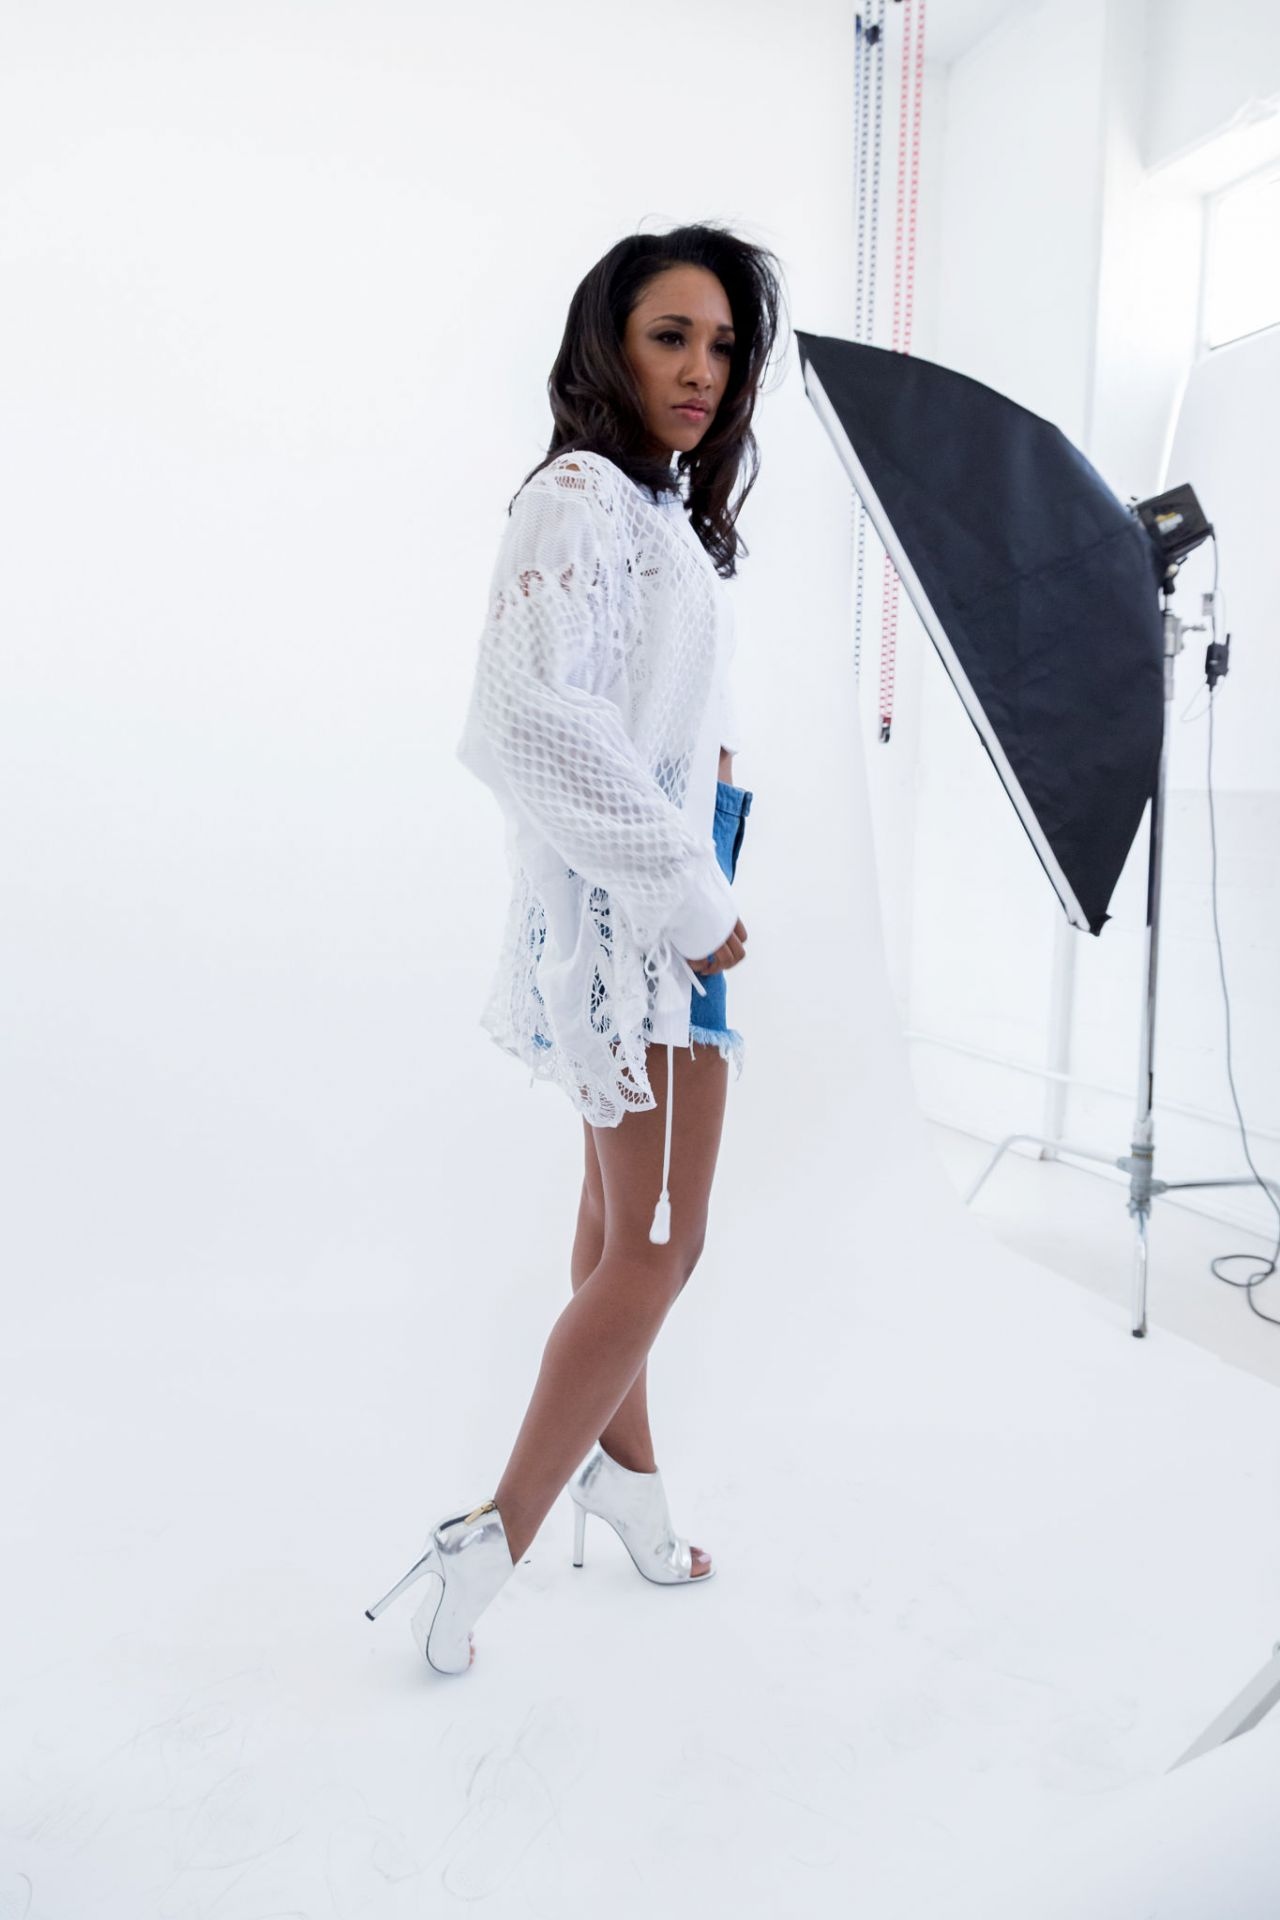 Candice Patton Photoshoot For Lapalme Magazine May 2016